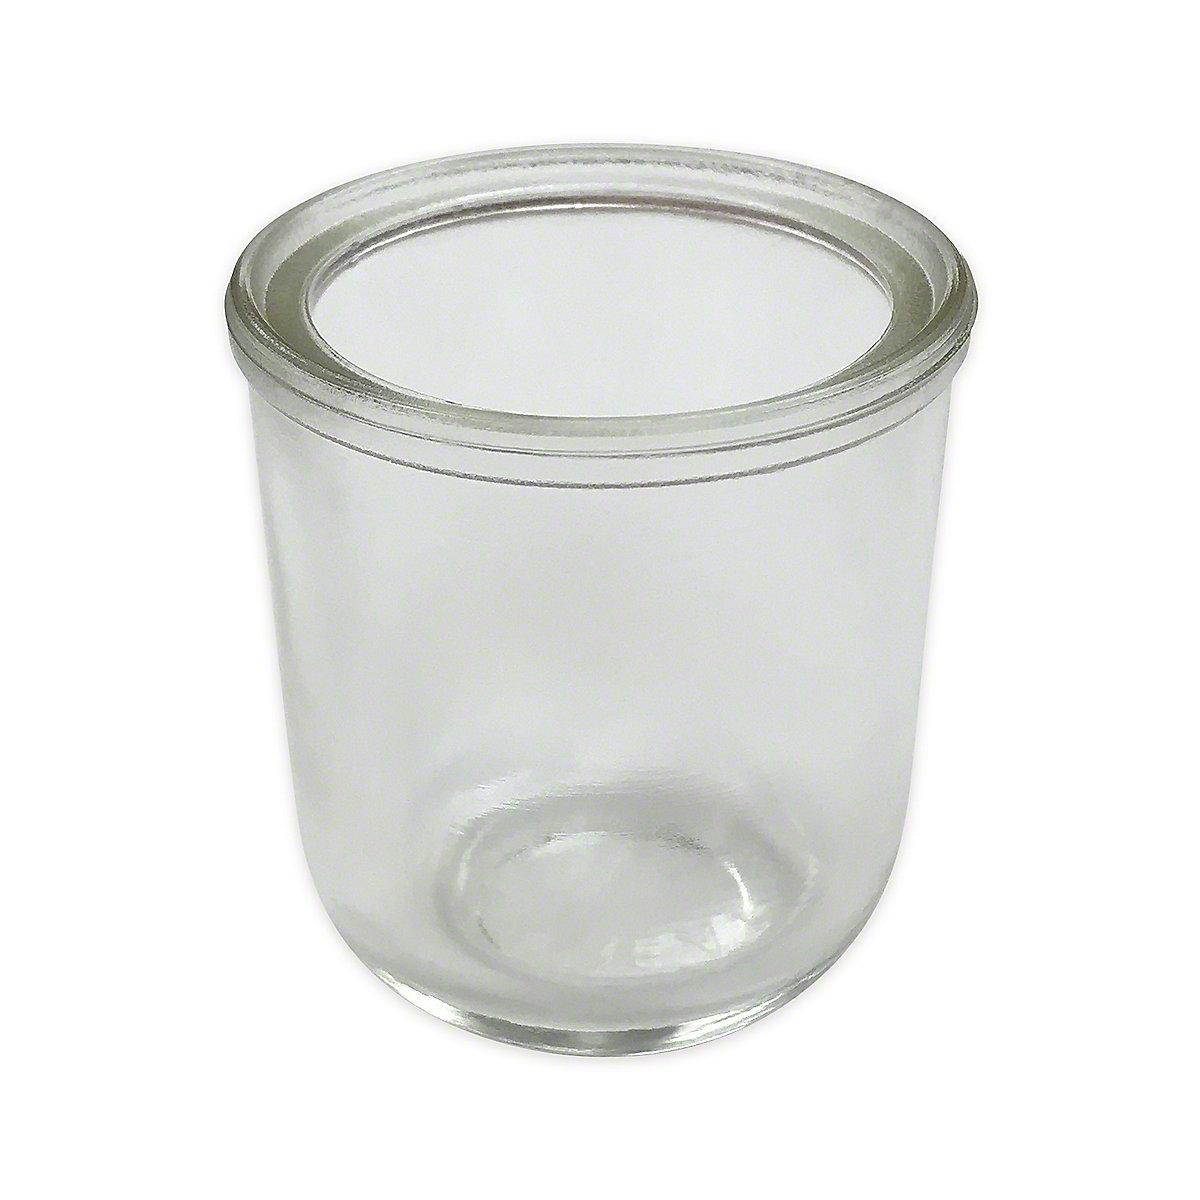 ABC124Sediment Glass Bowl Only